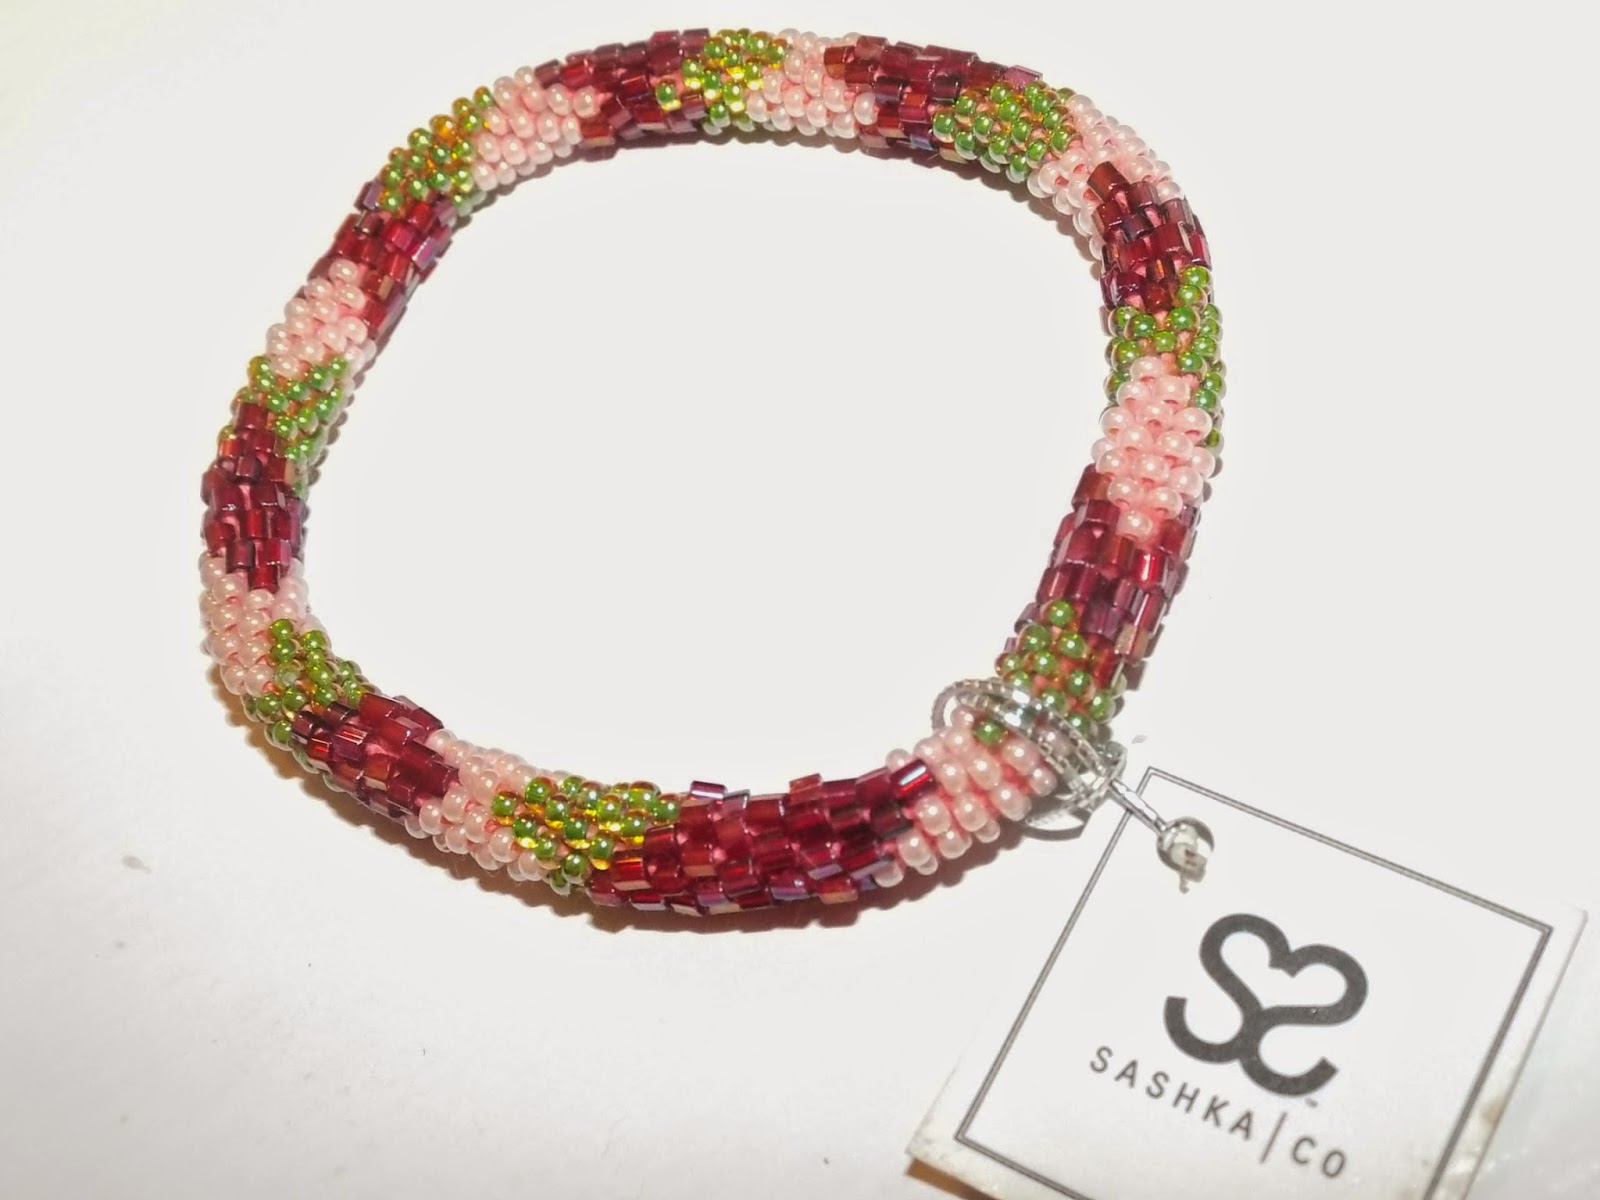 Bracelet from Sashka Co.